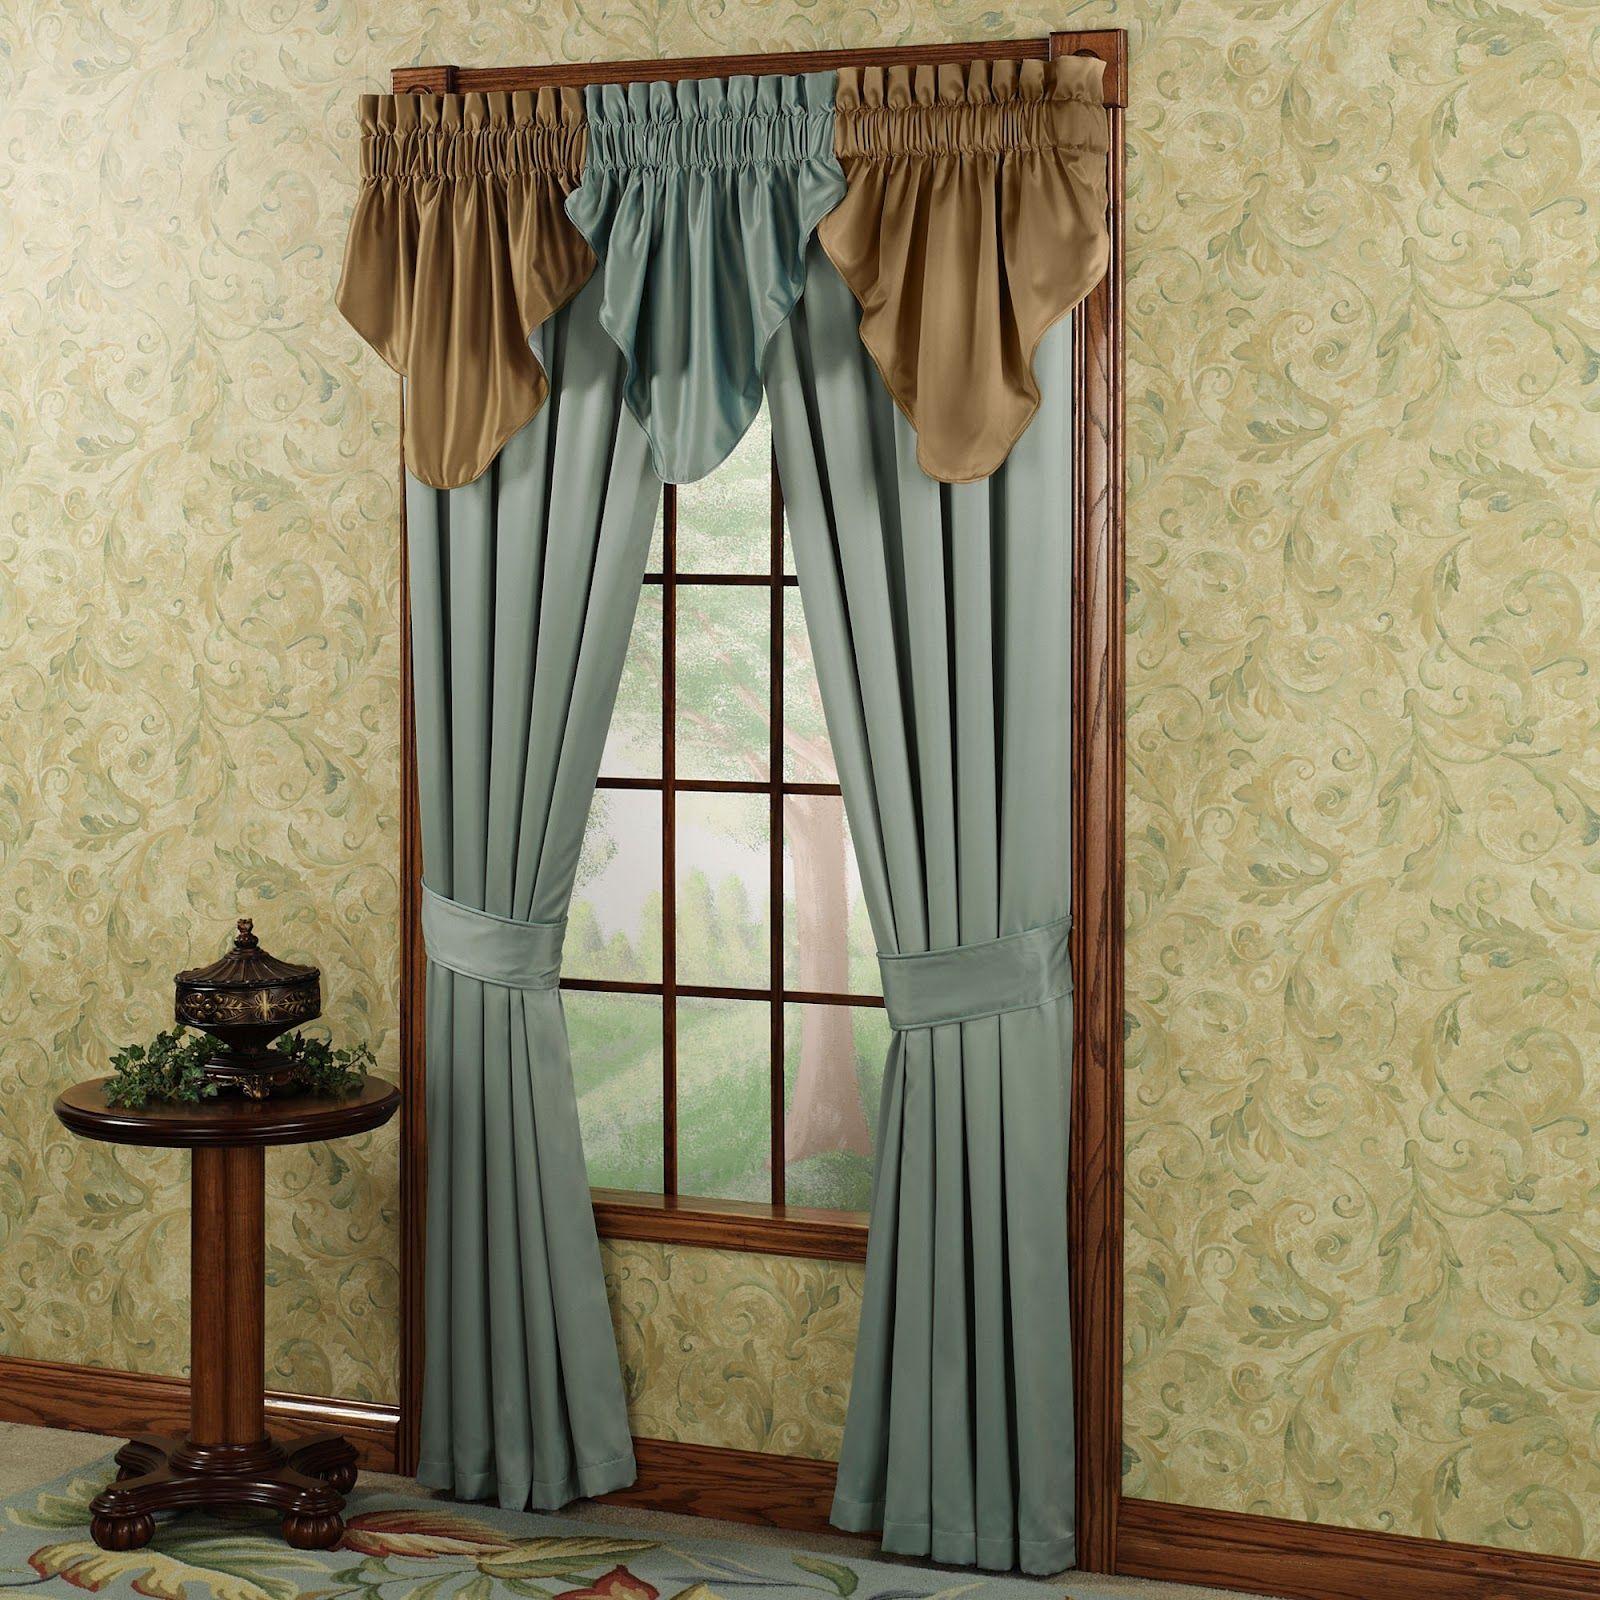 New Home Designs Latest Home Curtain Designs Ideas Hobbies